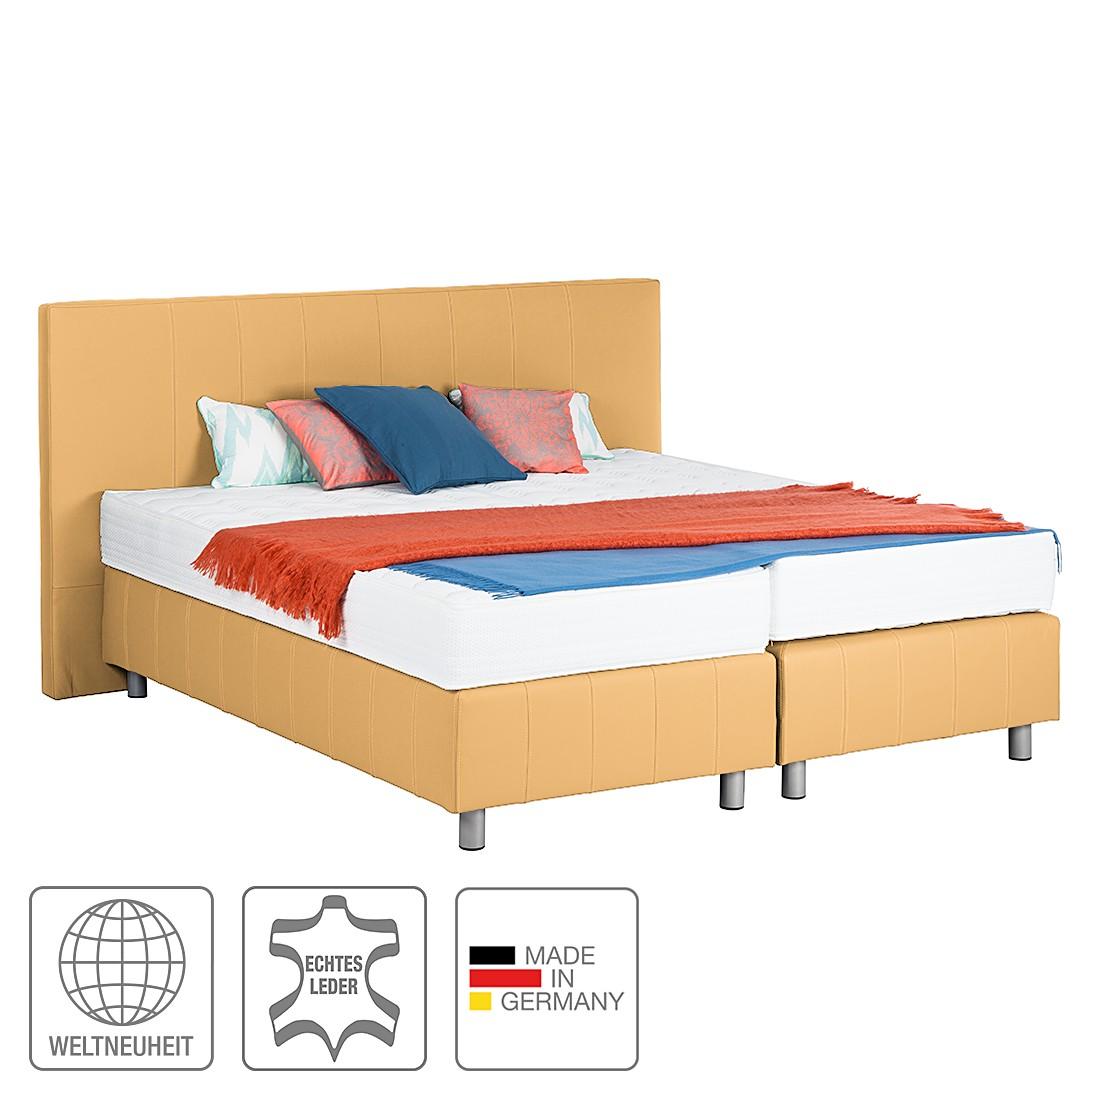 Boxspringbett Atlanta (Echtleder) - Ohne Topper - 180 x 200cm - H3 ab 80 kg - Gelb, Art of Sleep